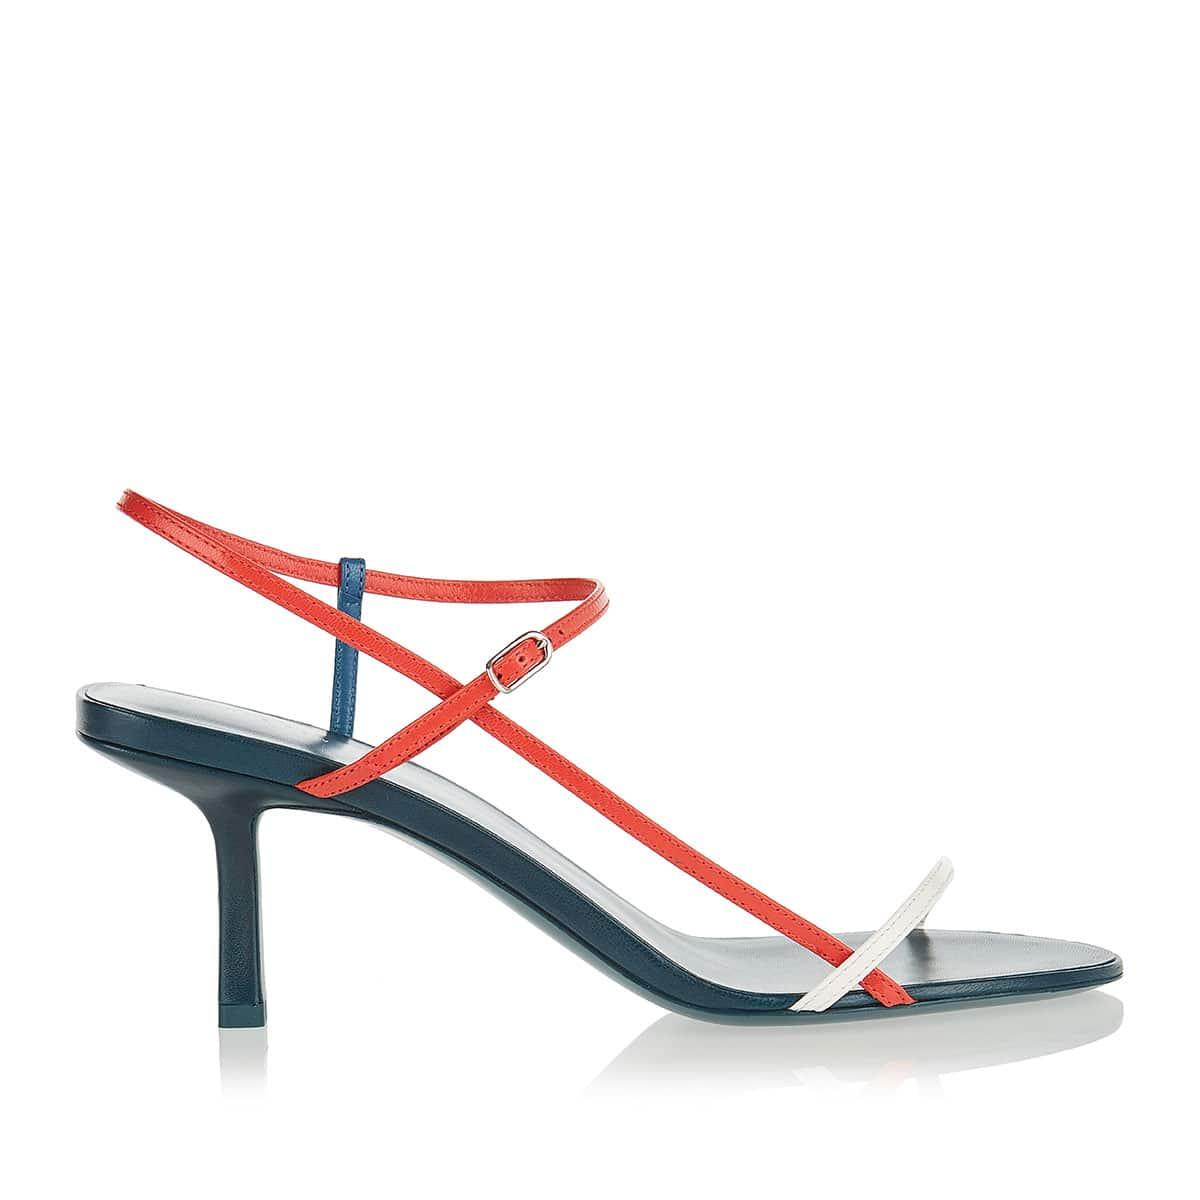 Bare 65 color-block sandals